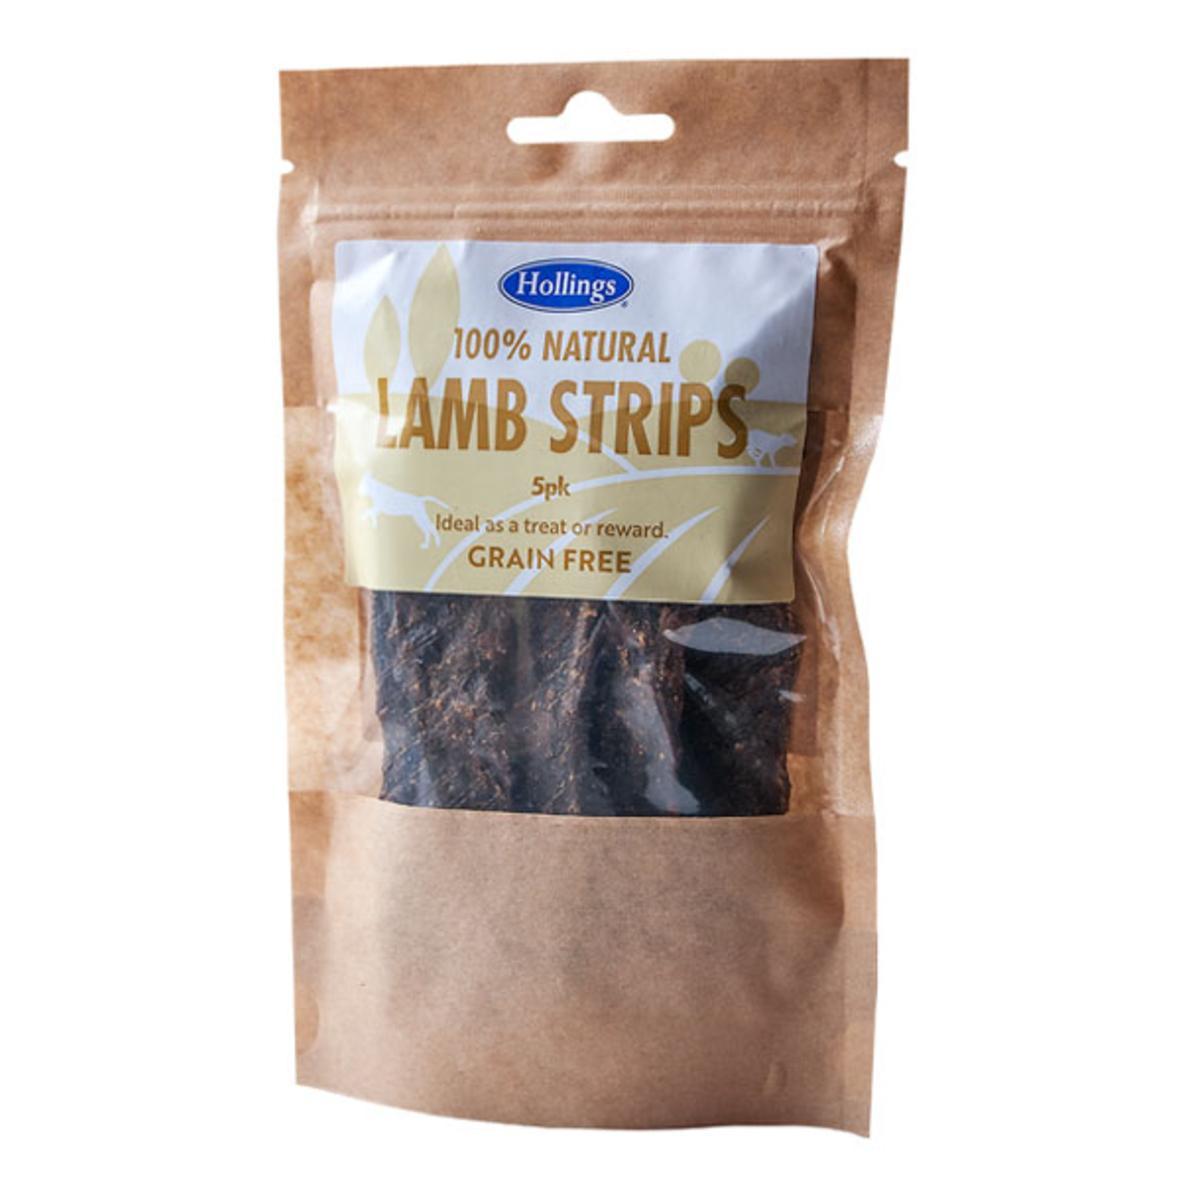 Hollings Lamb Strips 5pcs